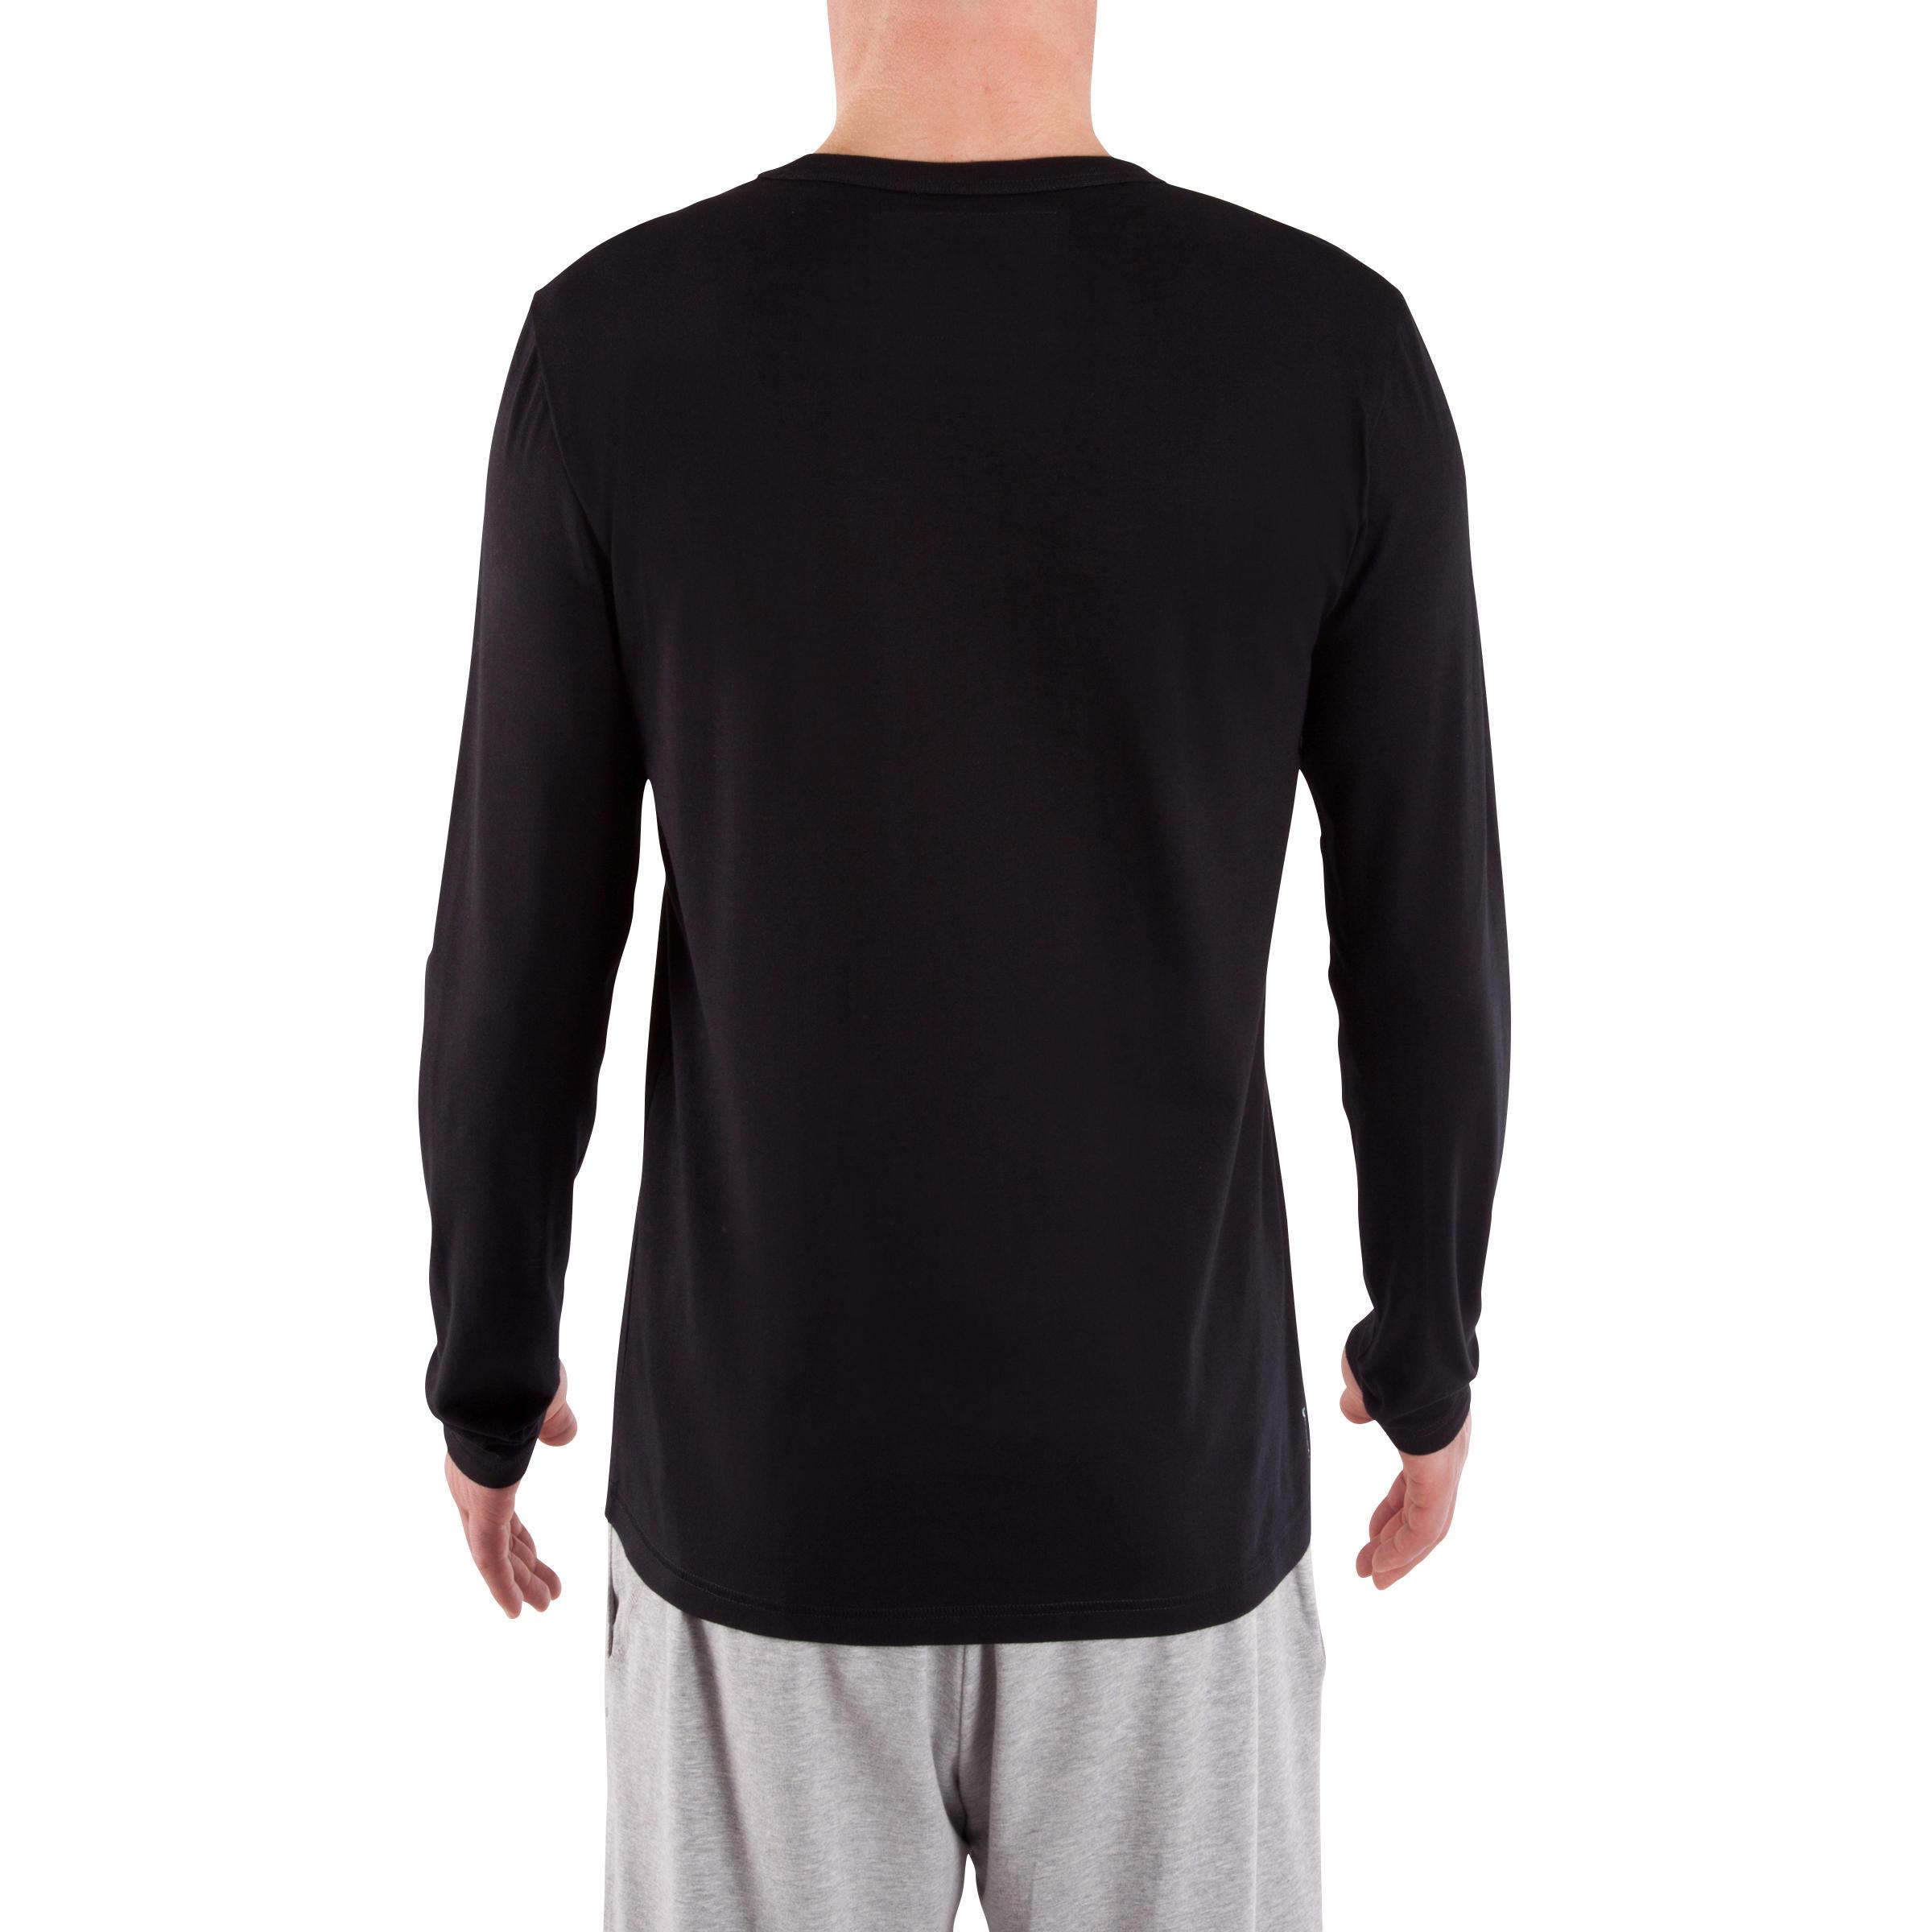 120 Regular-Fit Long-Sleeved Pilates & Gentle Gym T-Shirt - Black